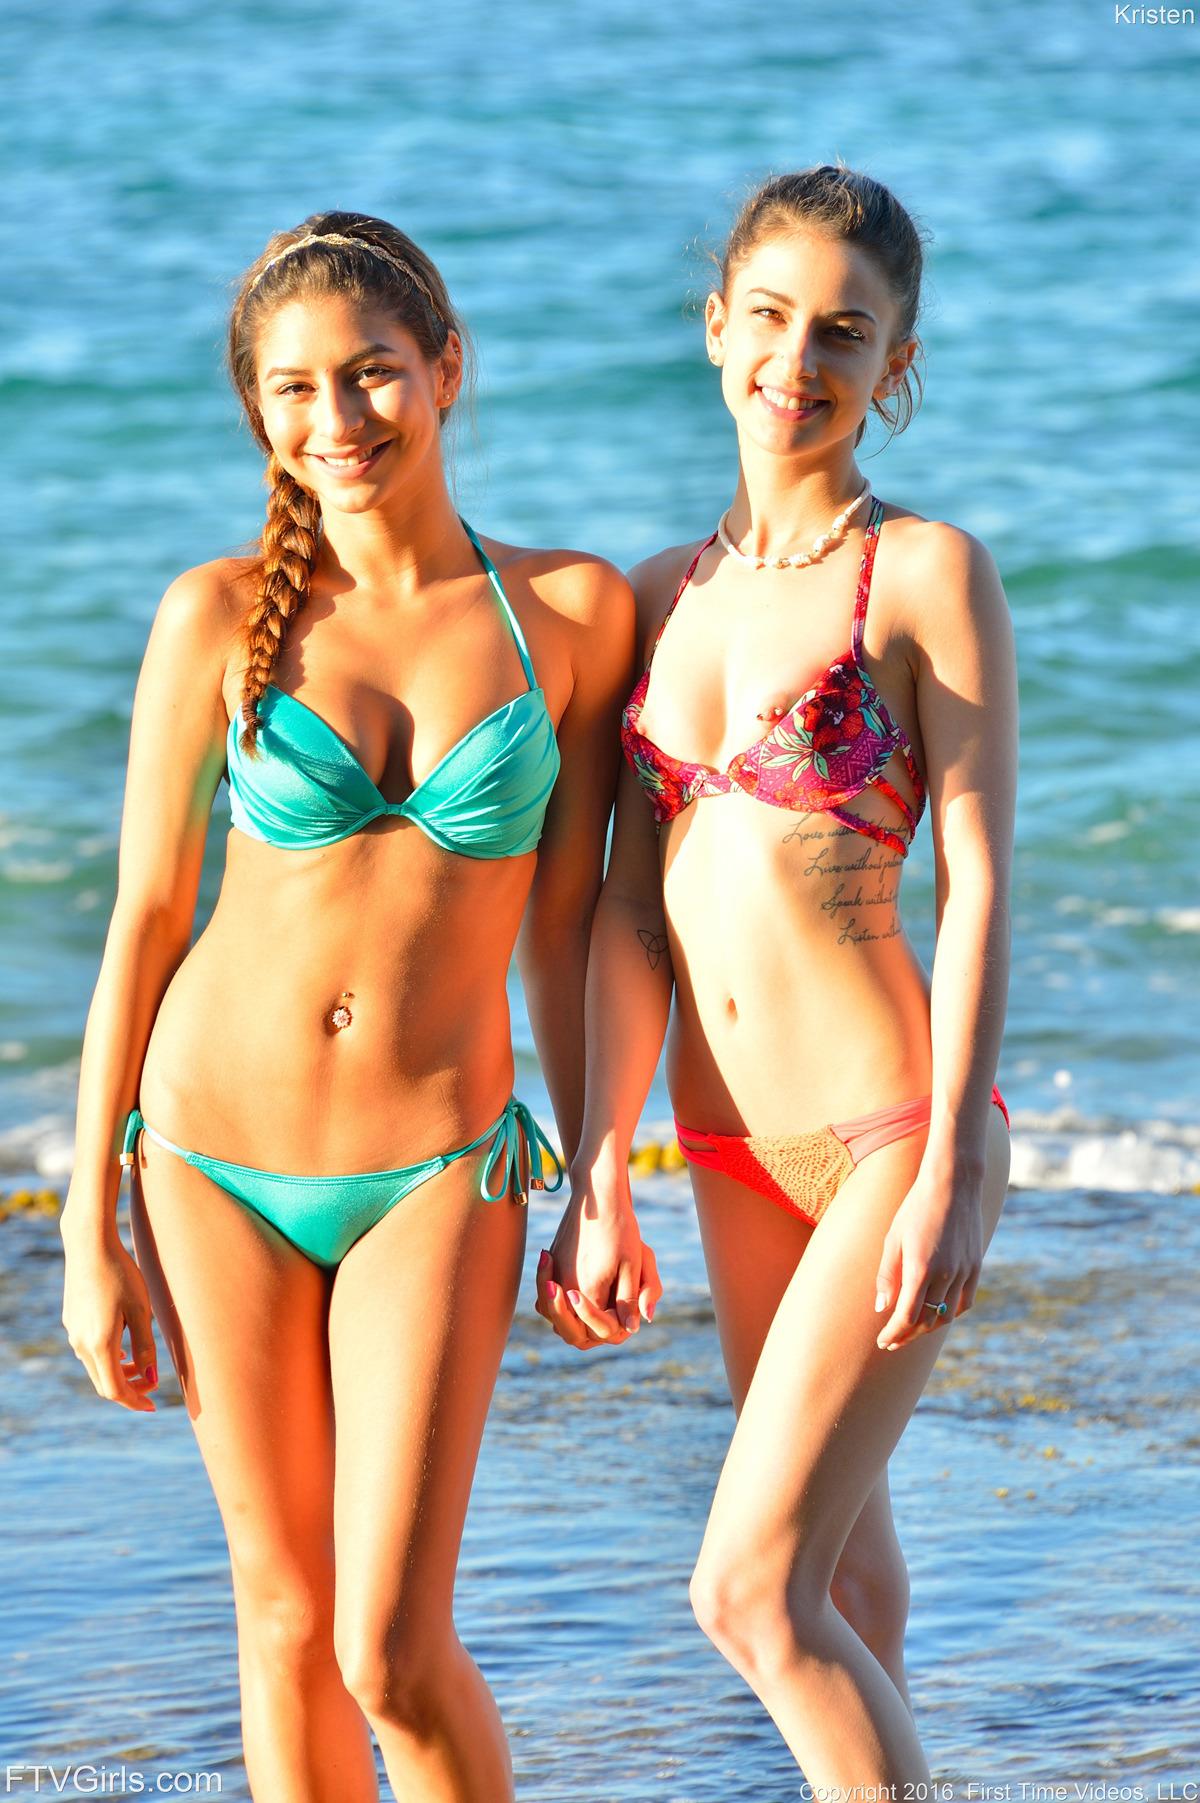 PHOTO | 00 17 - Kristen And Nina Kinky Ocean View